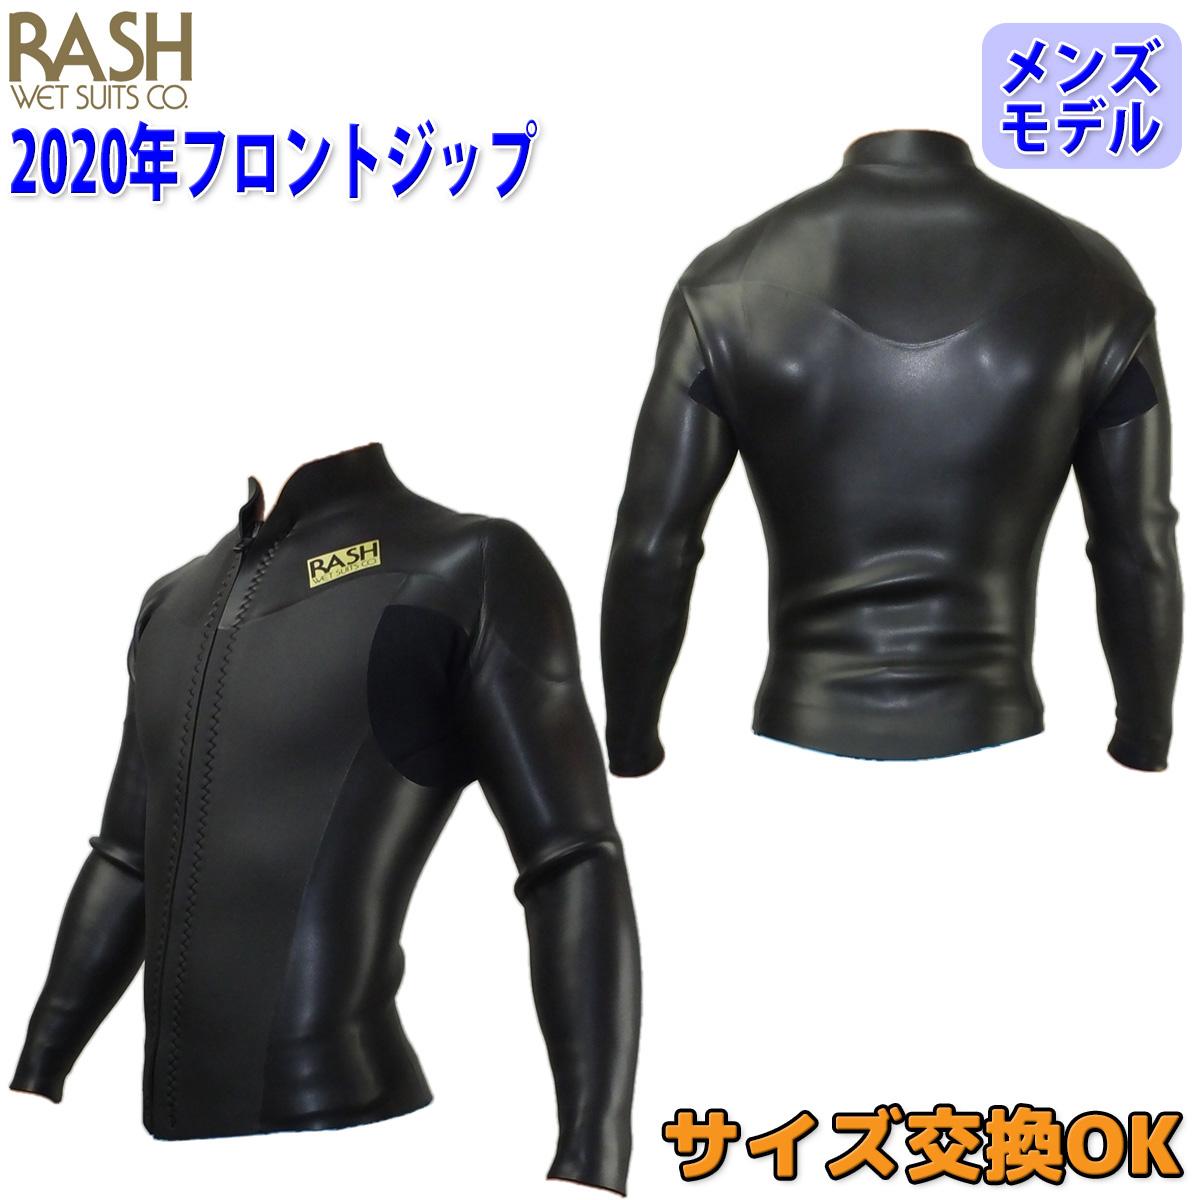 20 RASH ラッシュ 長袖タッパー ウェットスーツ ウエットスーツ フロントジッパー バリュー 春夏用 メンズモデル 2020年 日本正規品